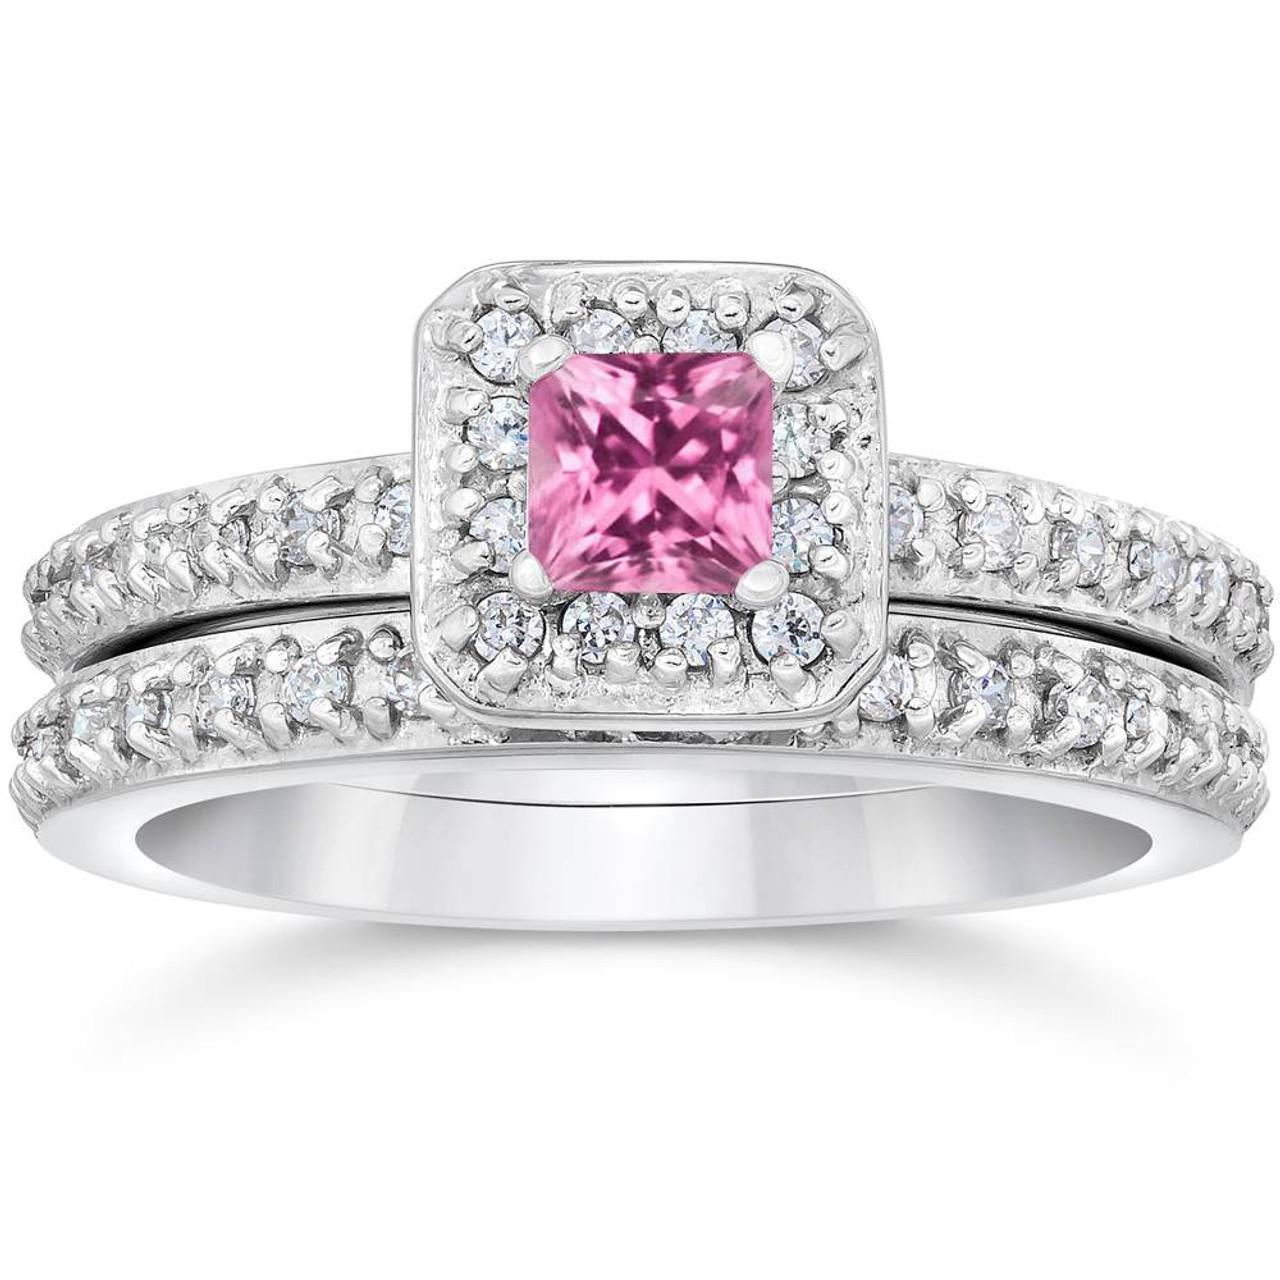 Princess Cut Pink Sapphire 1 1/3ct Pave Vintage Diamond Ring Set 14K White  Gold (G/H, I1)